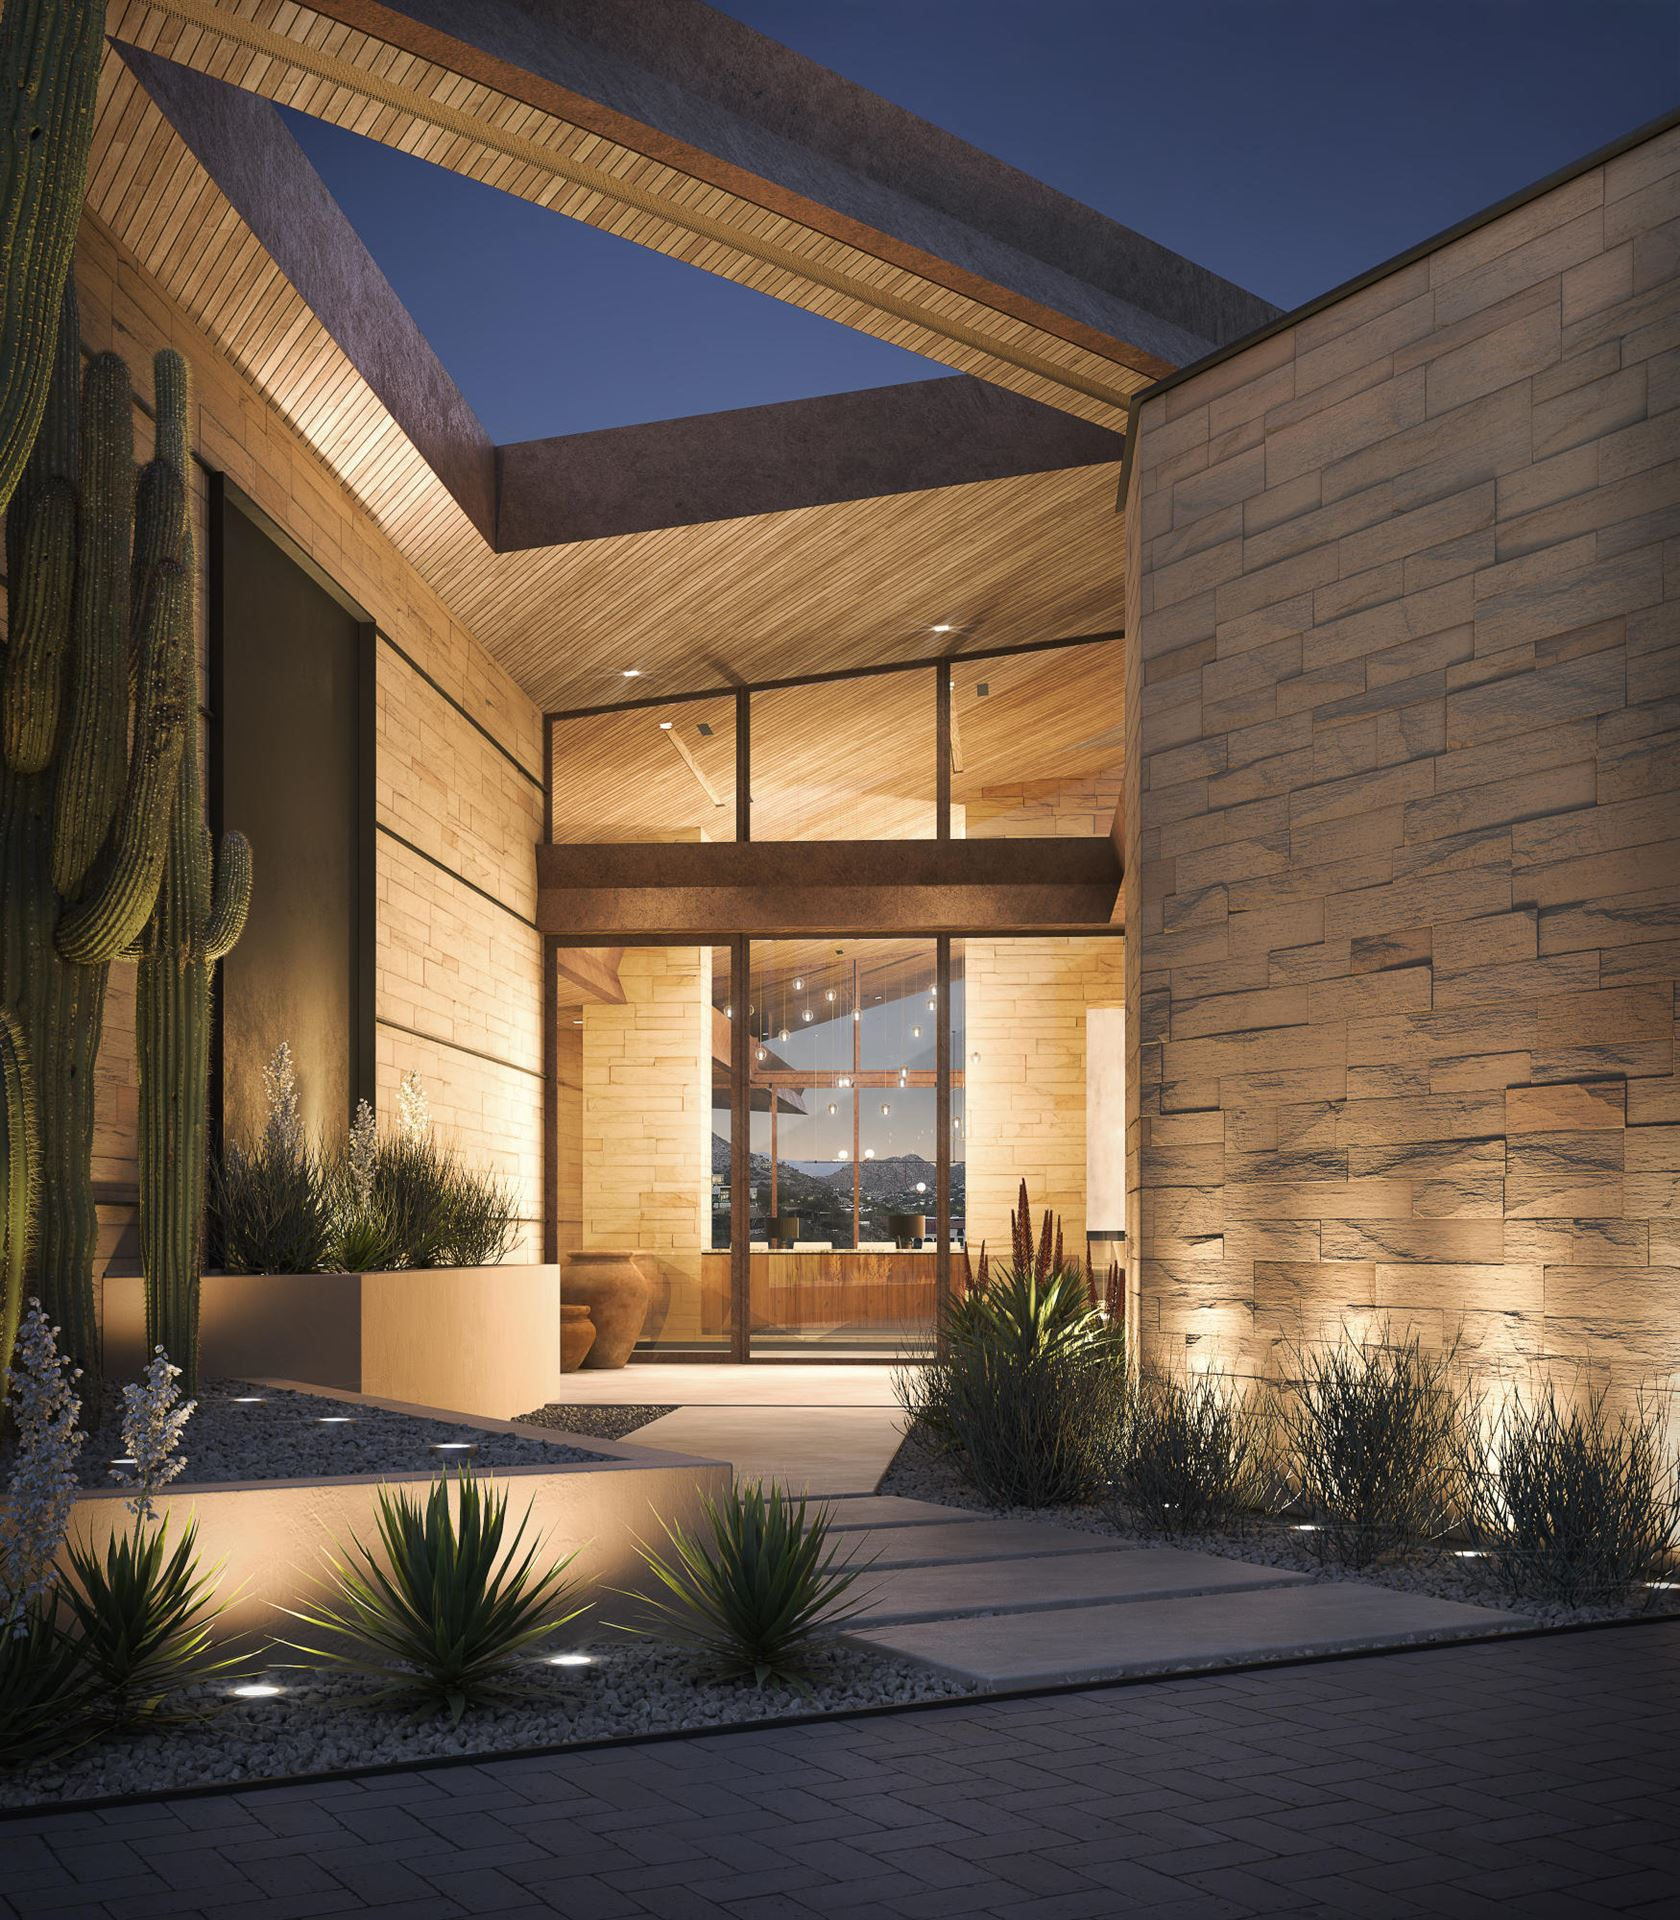 Photo of 7140 N 40TH Street, Paradise Valley, AZ 85253 (MLS # 6189626)